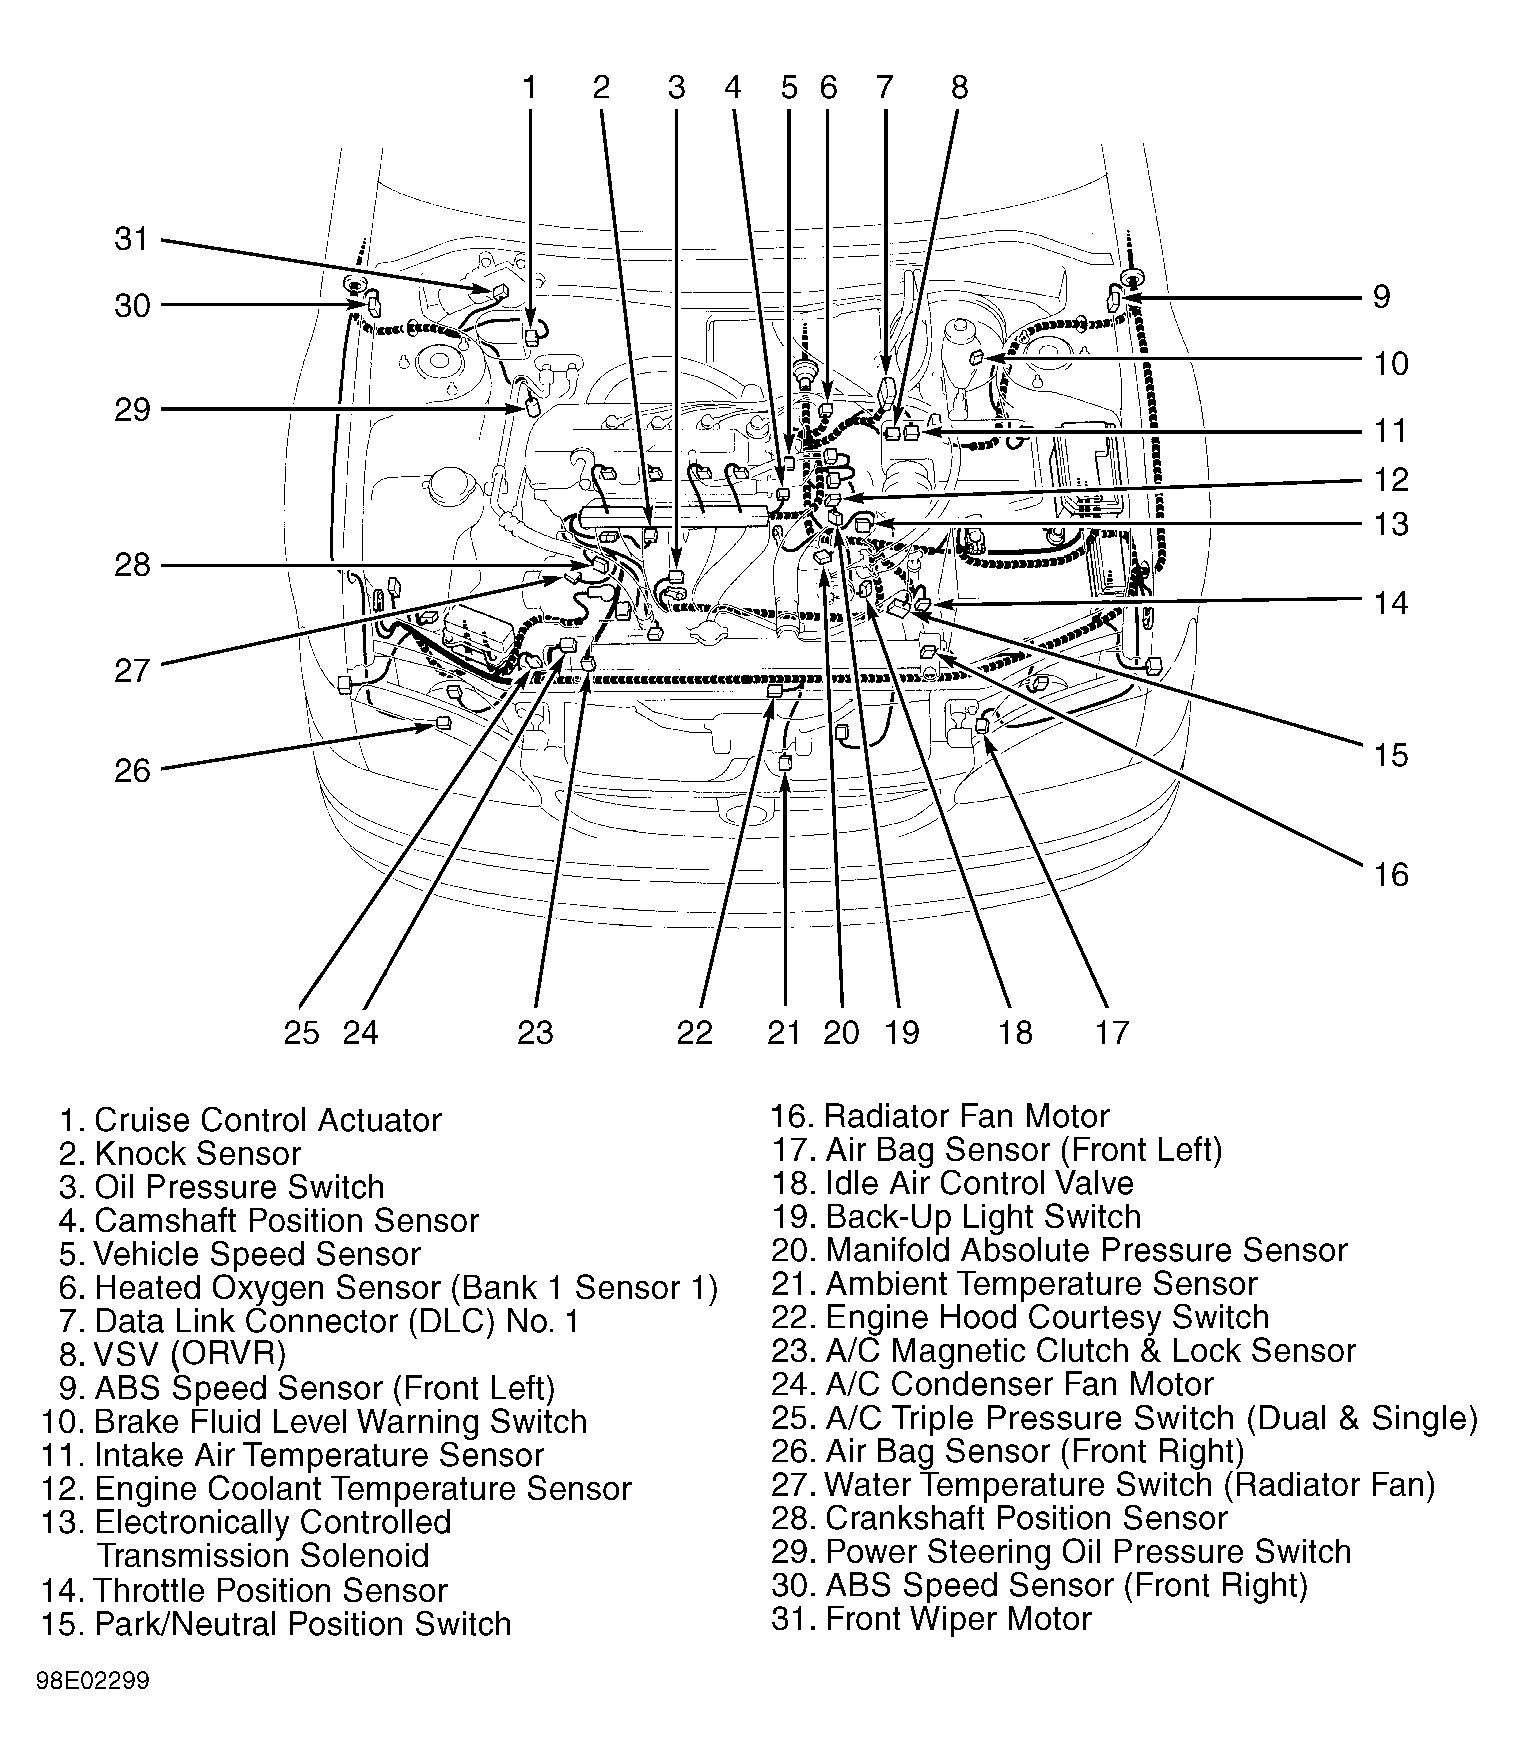 1999 Toyota Camry Engine Diagram